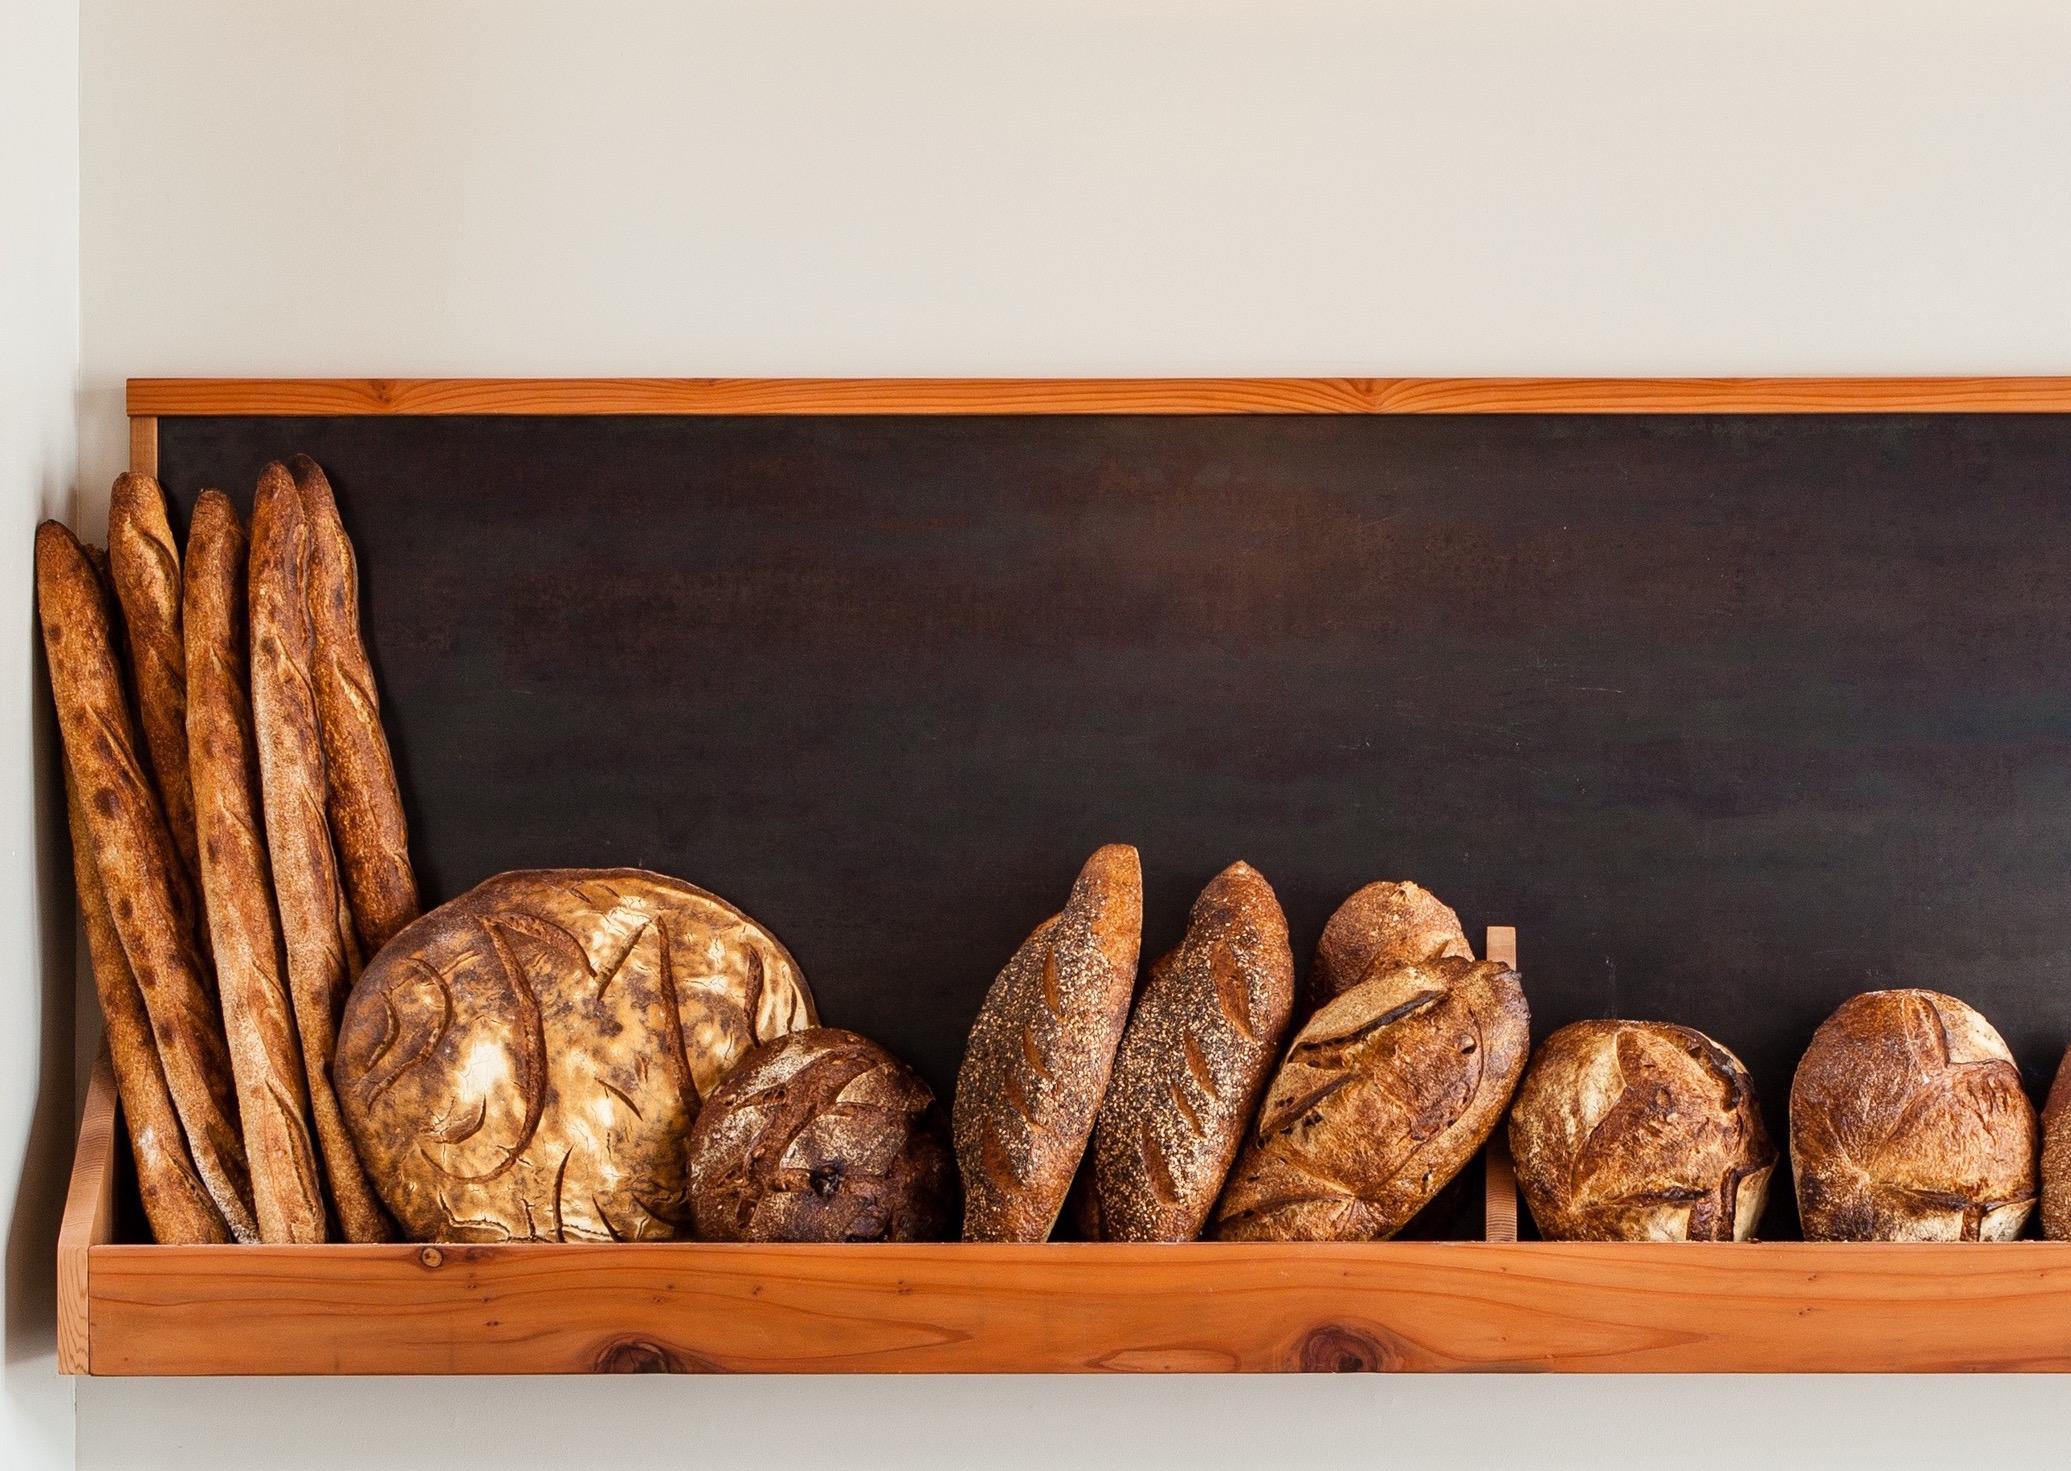 Le Marais Bakery. Crédit: Alana Hale